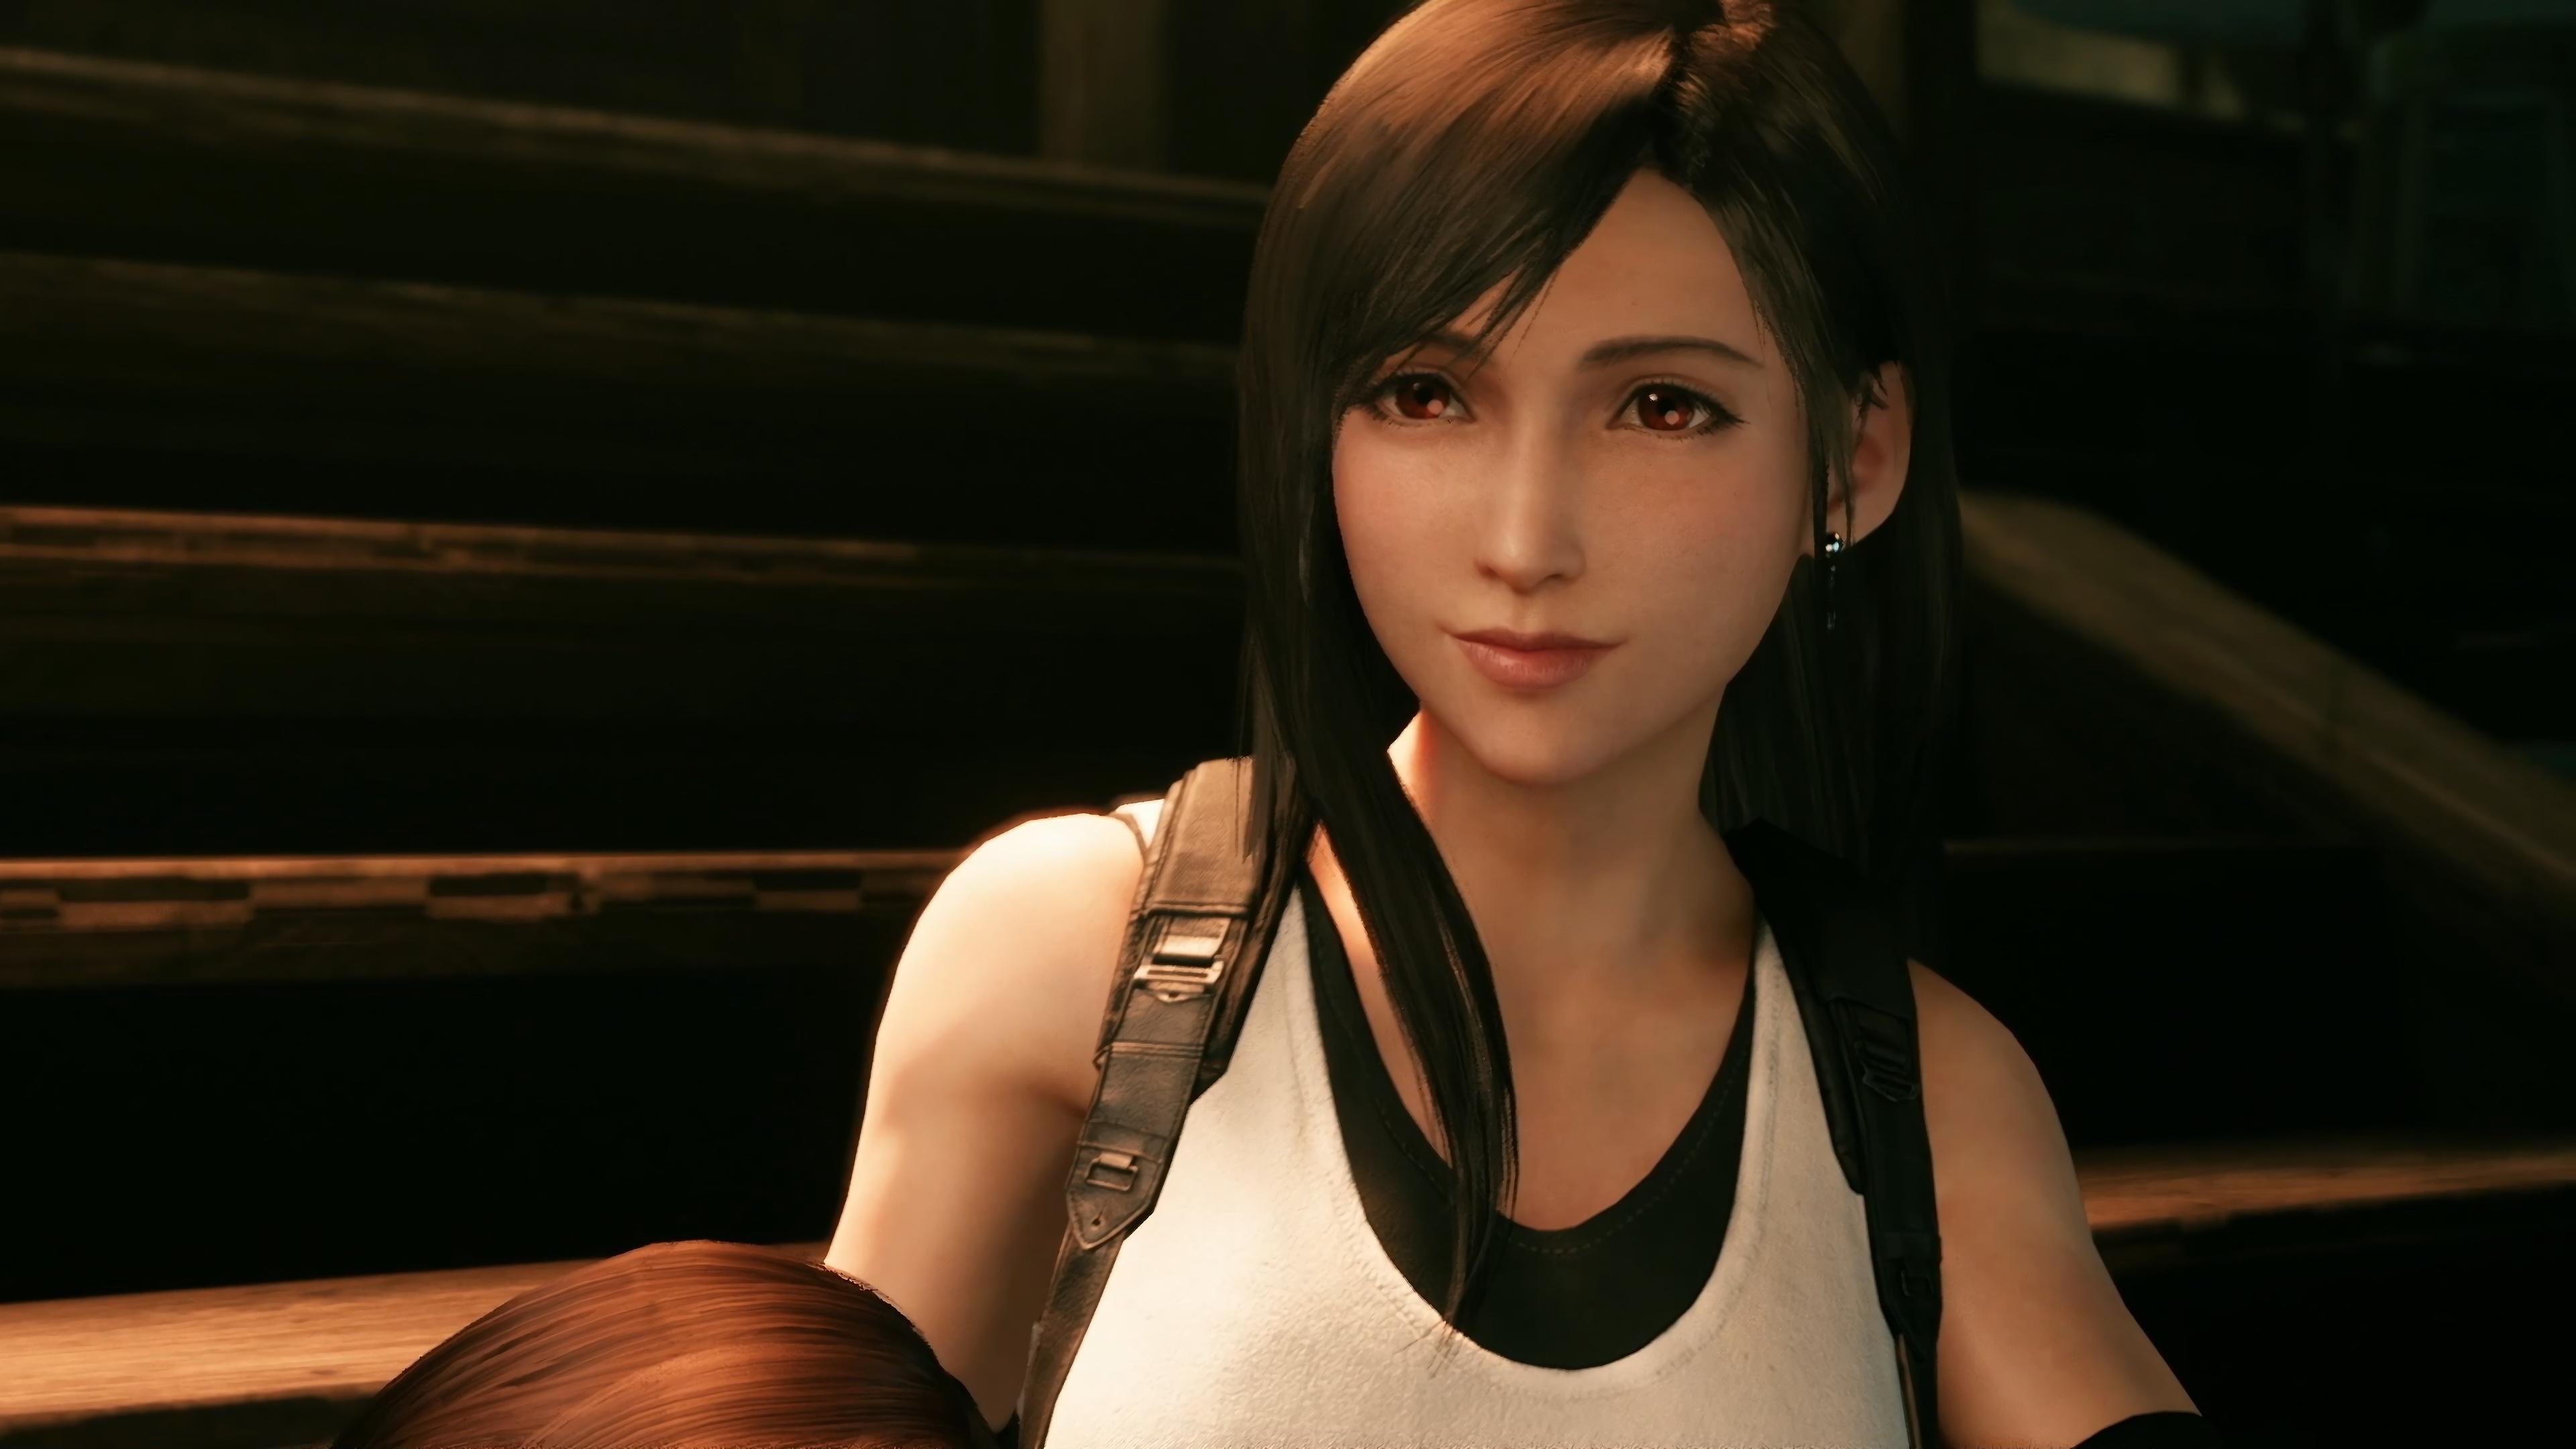 Tifa Lockhart, Final Fantasy 7 Remake, 4K, #19 Wallpaper